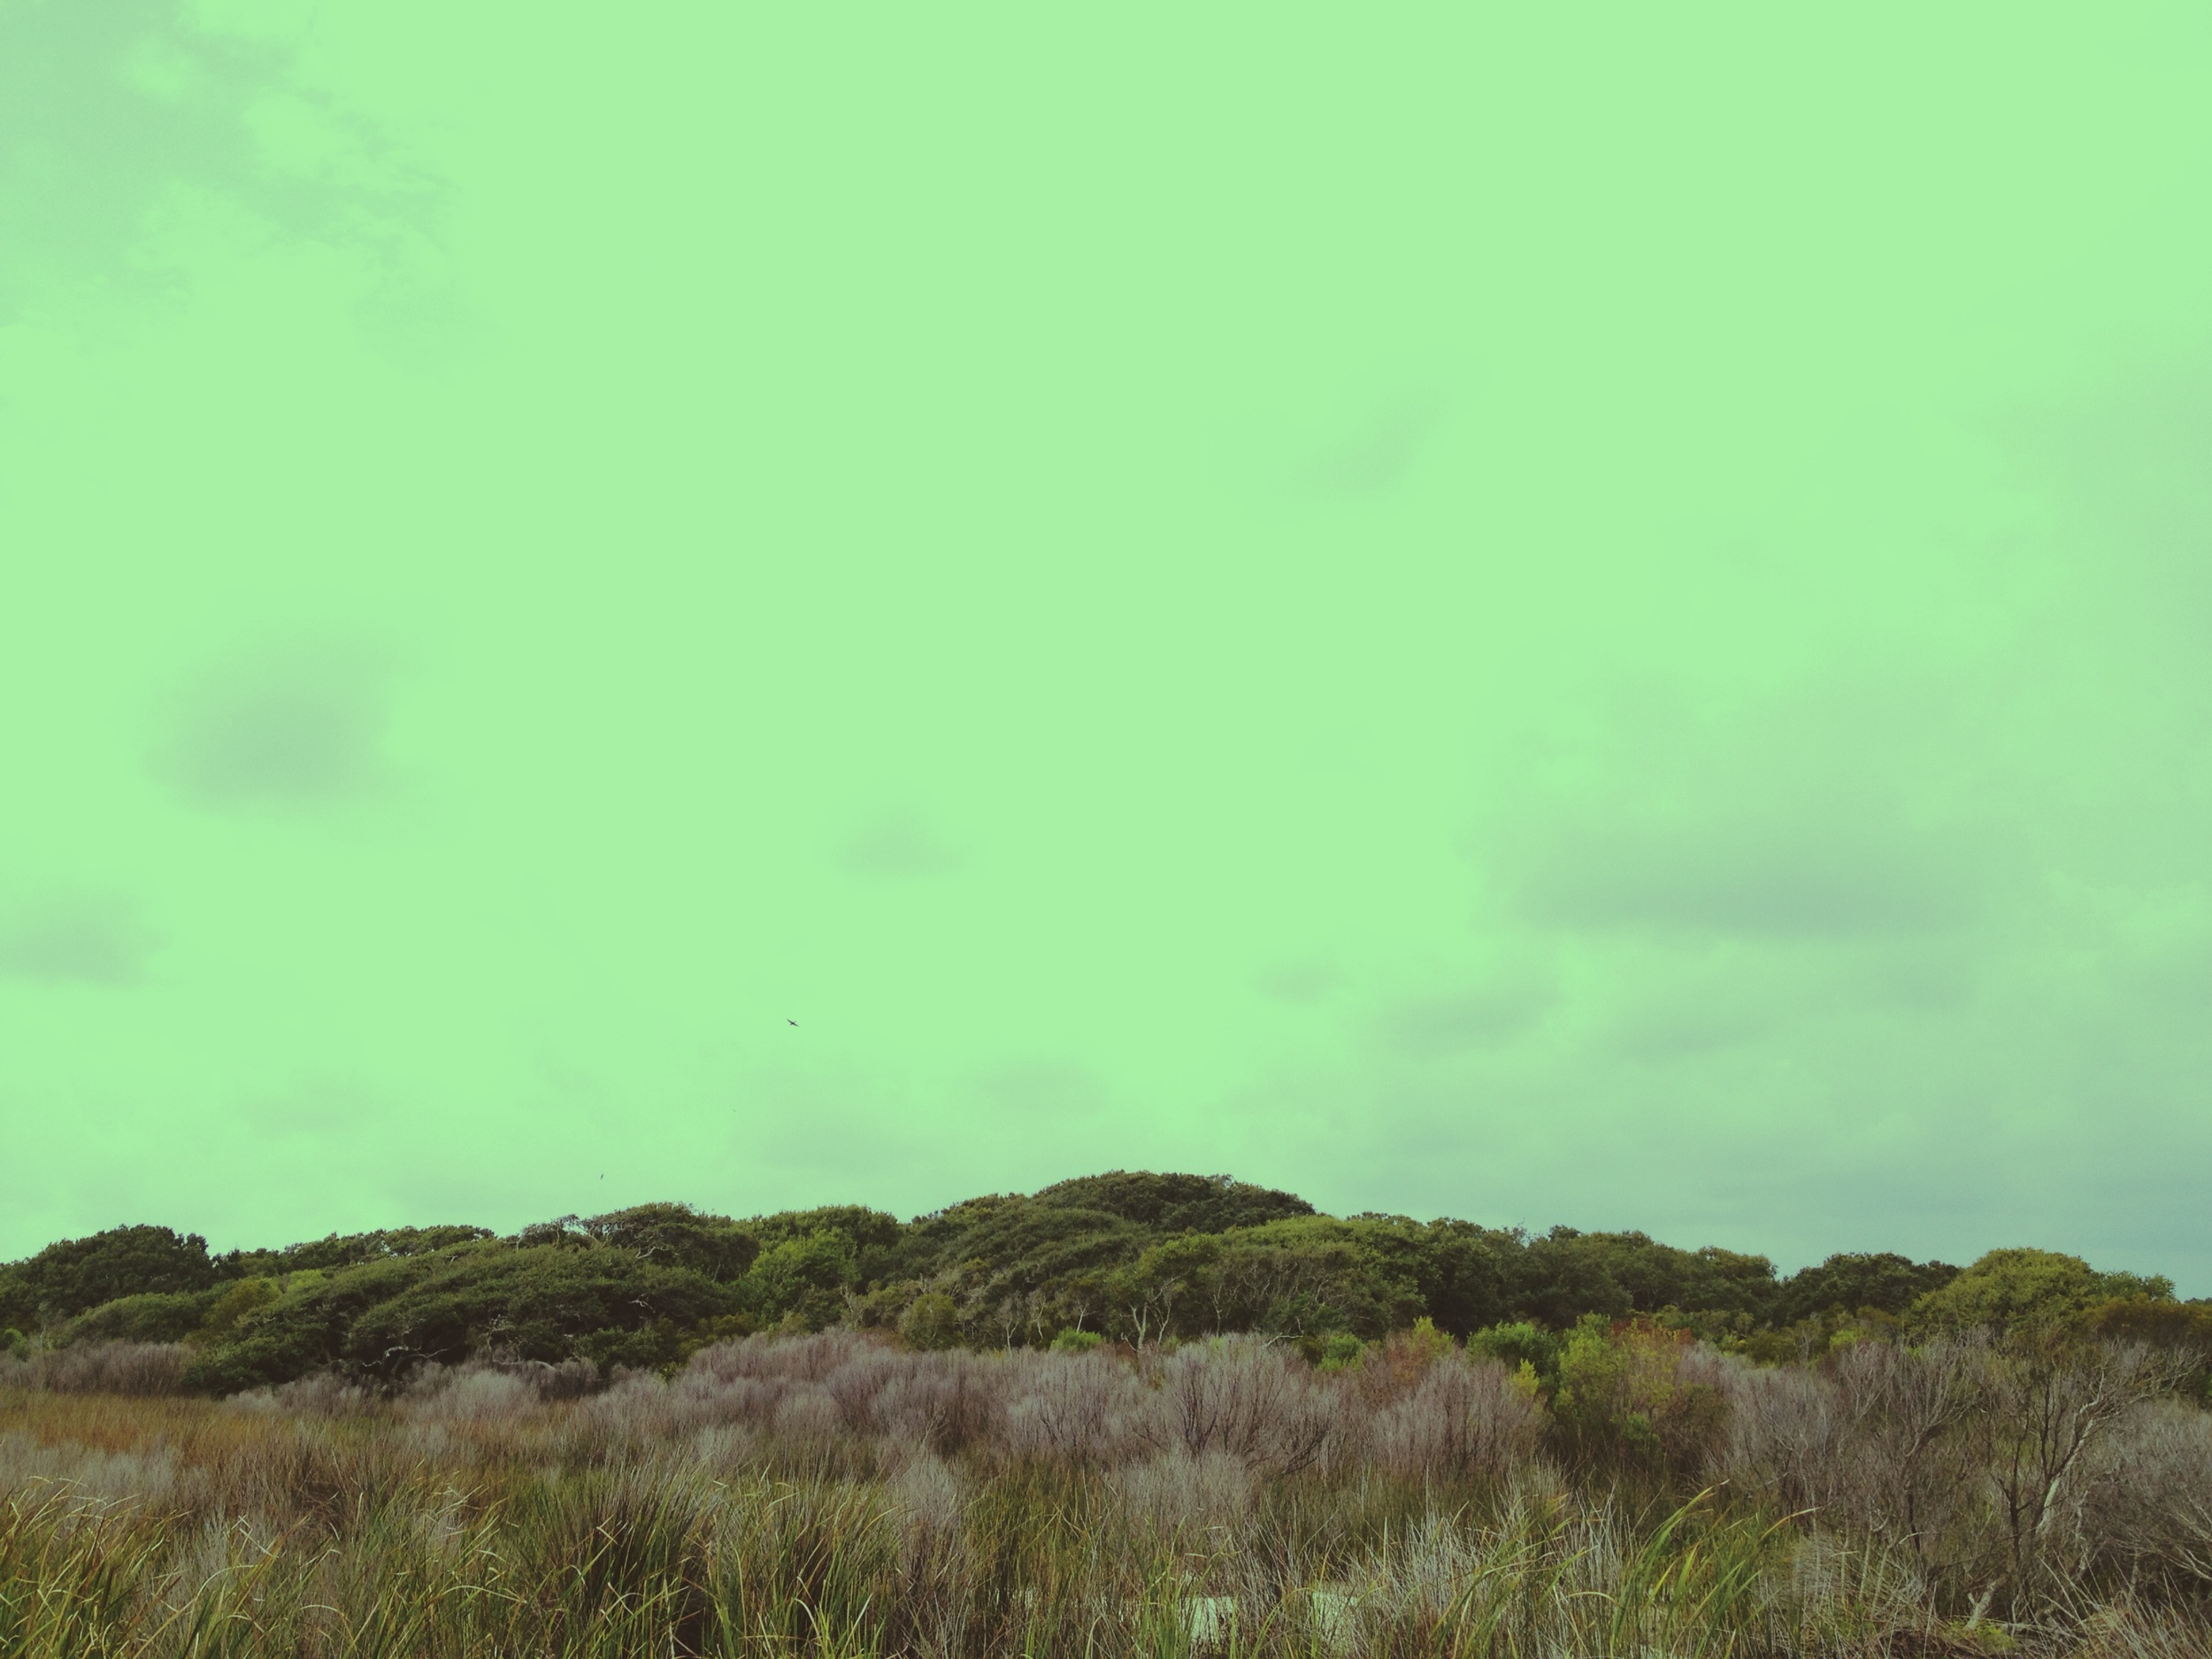 Forest / Blackbeard Island National Wildlife Refuge 2014 © Manda Faye Dunigan